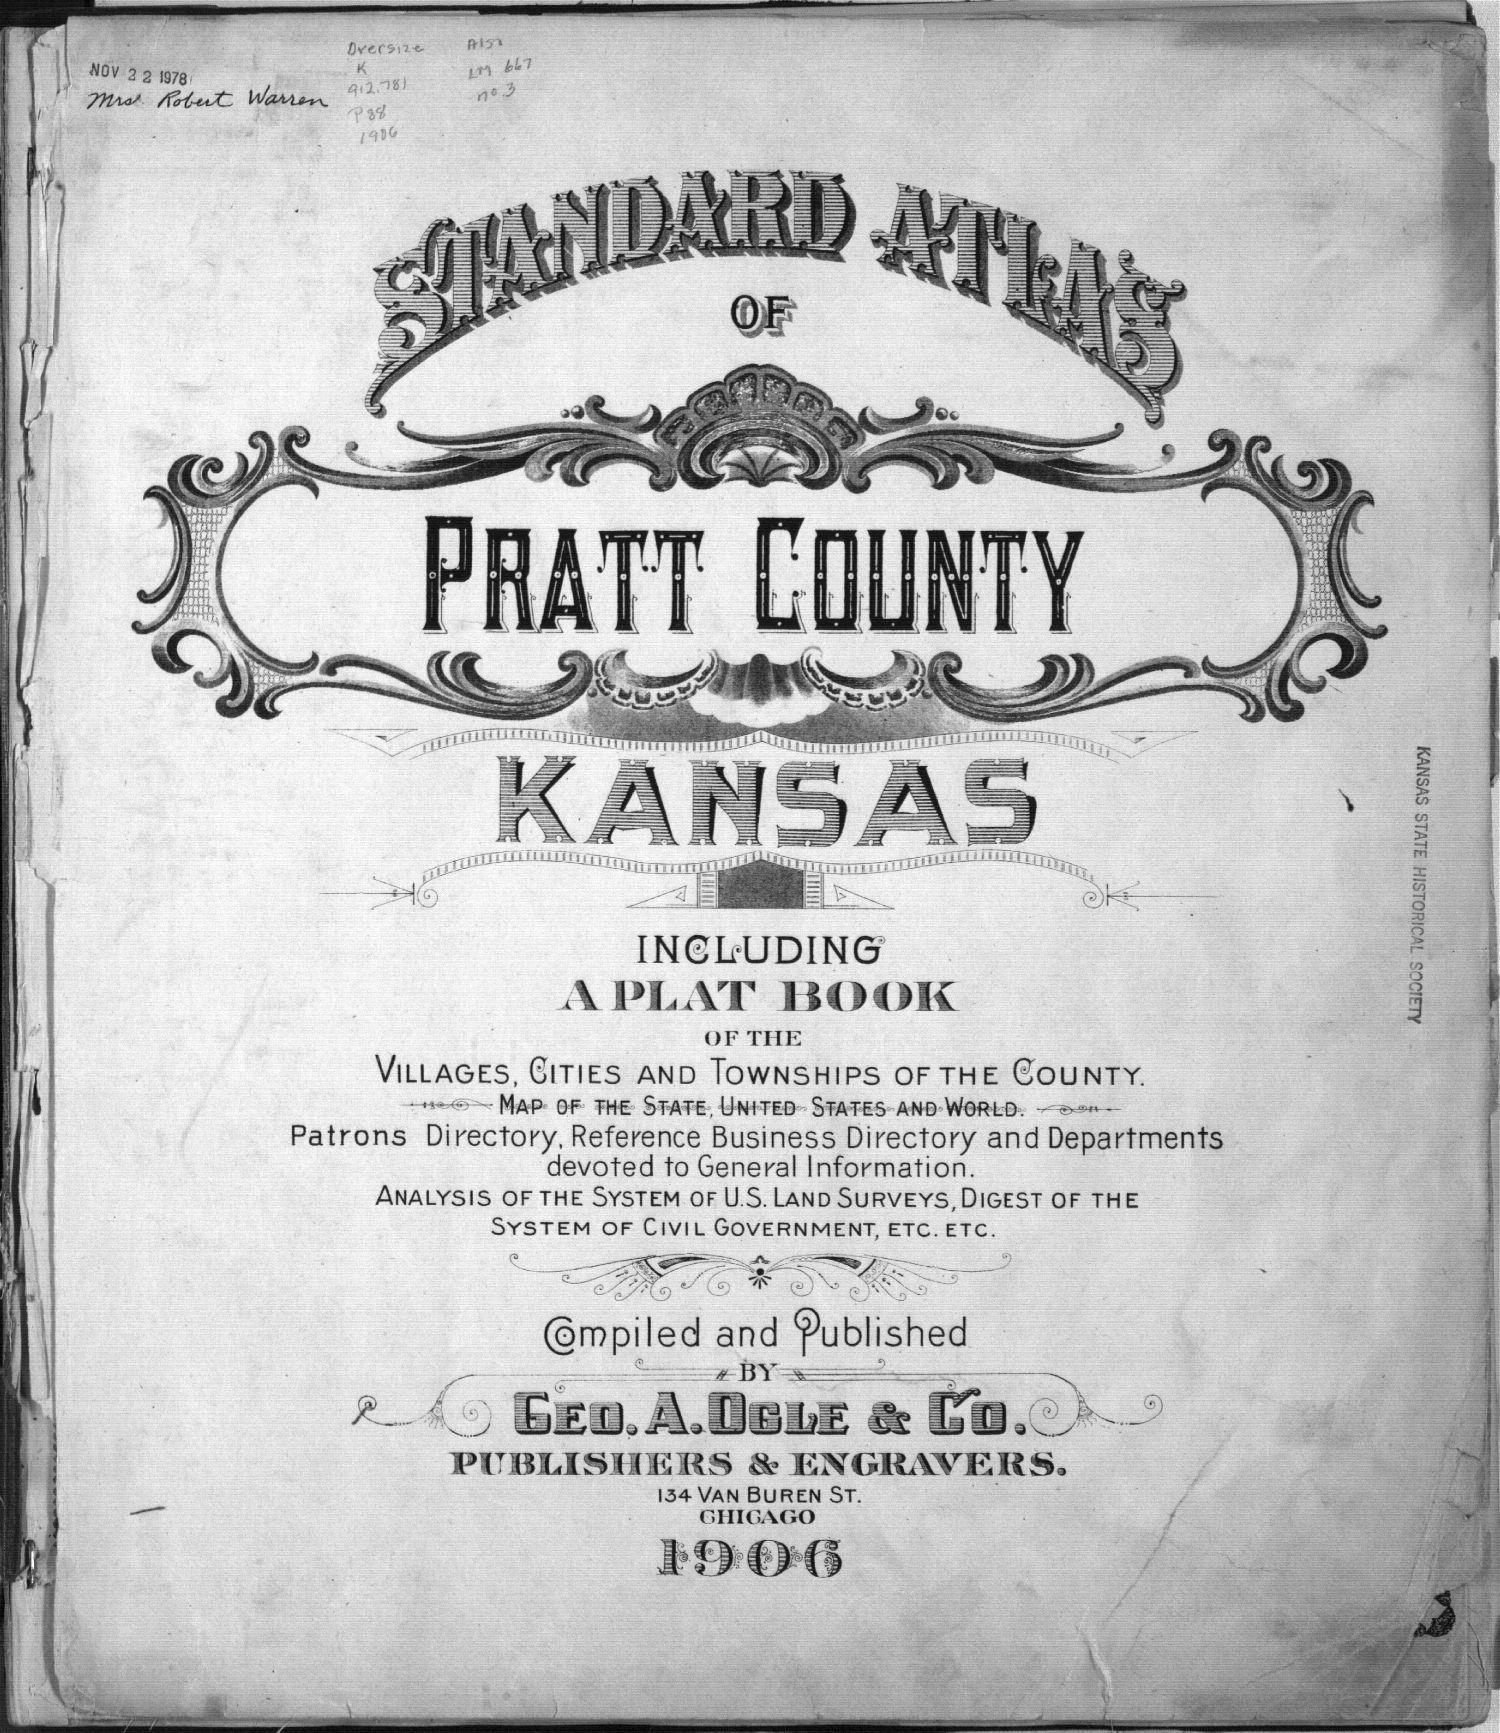 Standard atlas of Pratt County, Kansas - Title page